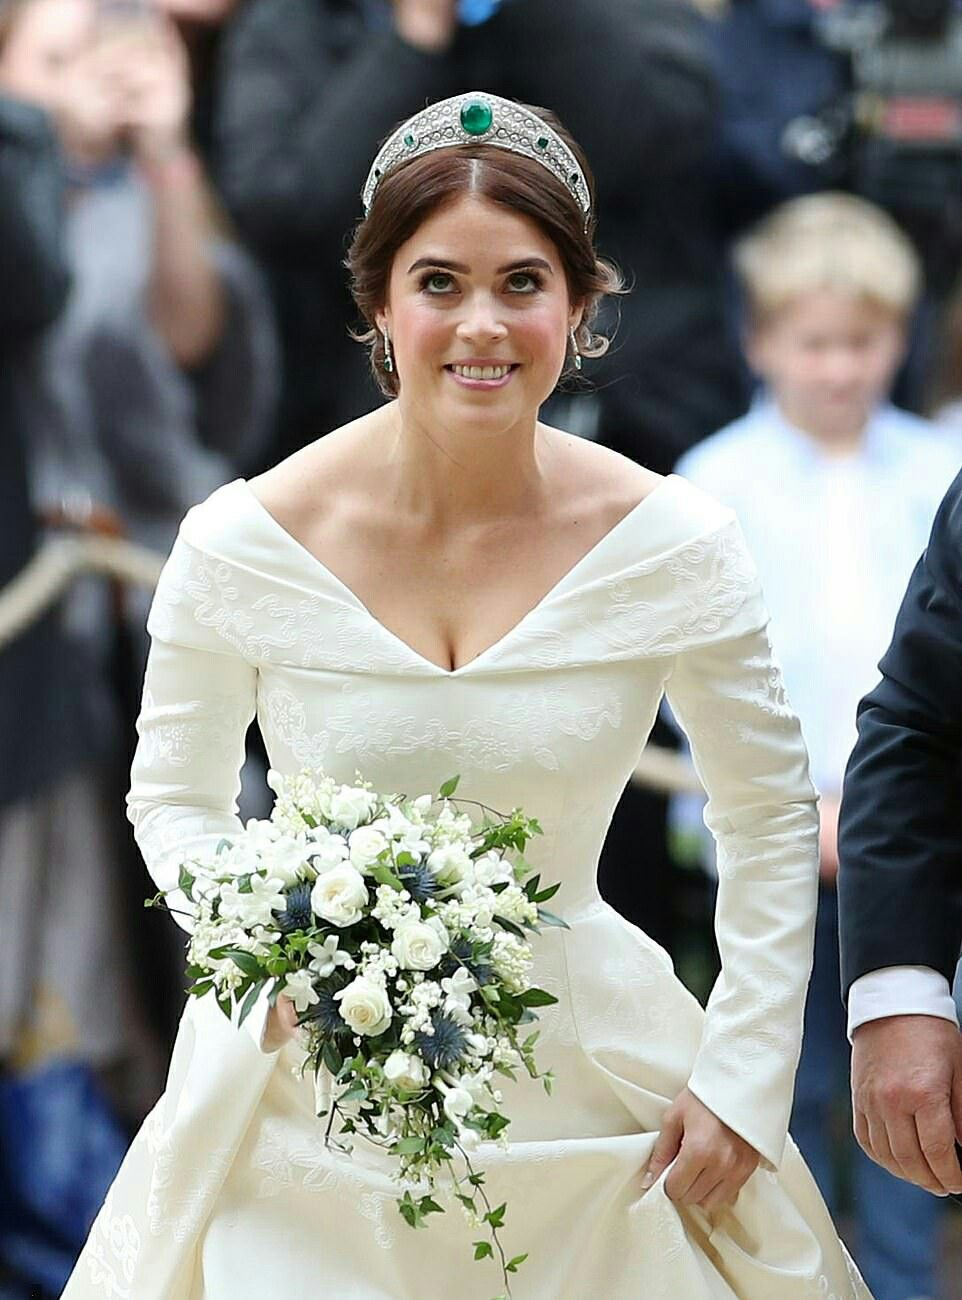 The Wedding of Princess Eugenie of York to Jack Brooksbank